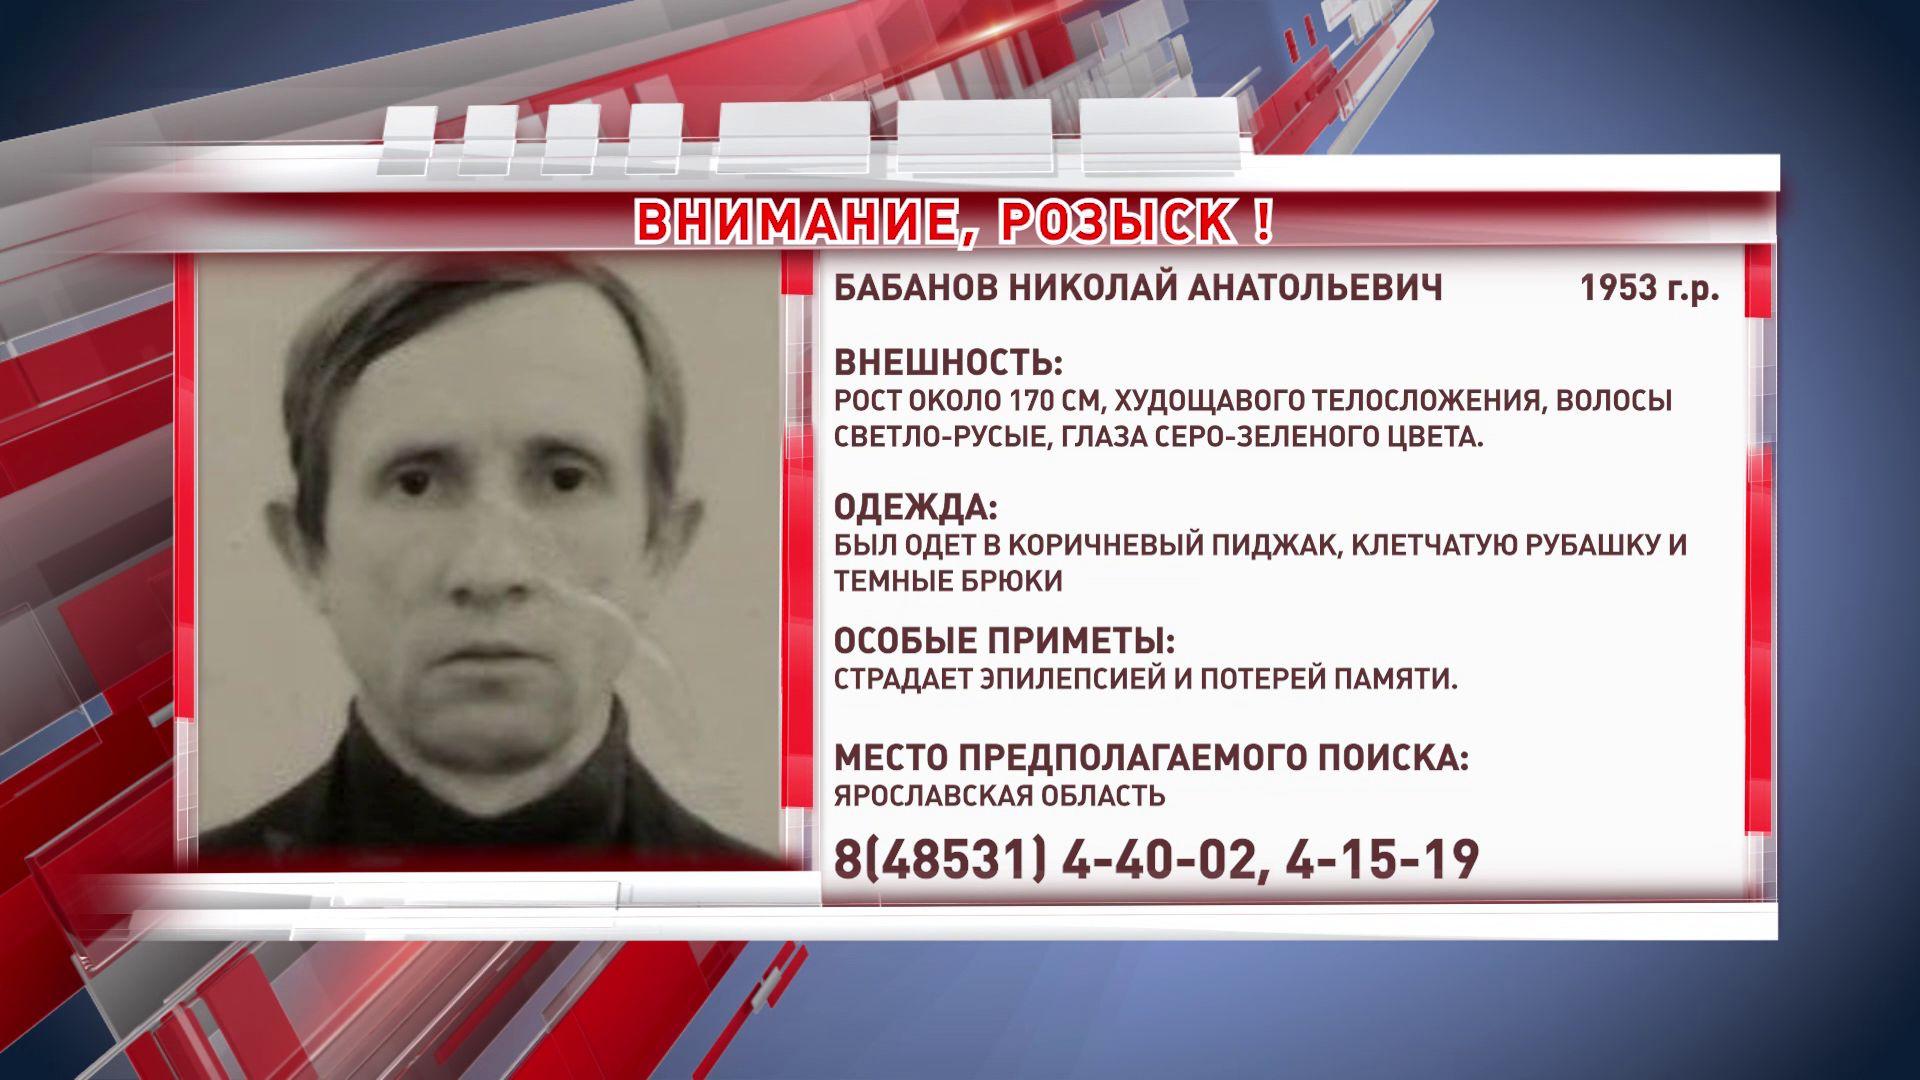 В Ярославской области пропал 67-летний мужчина